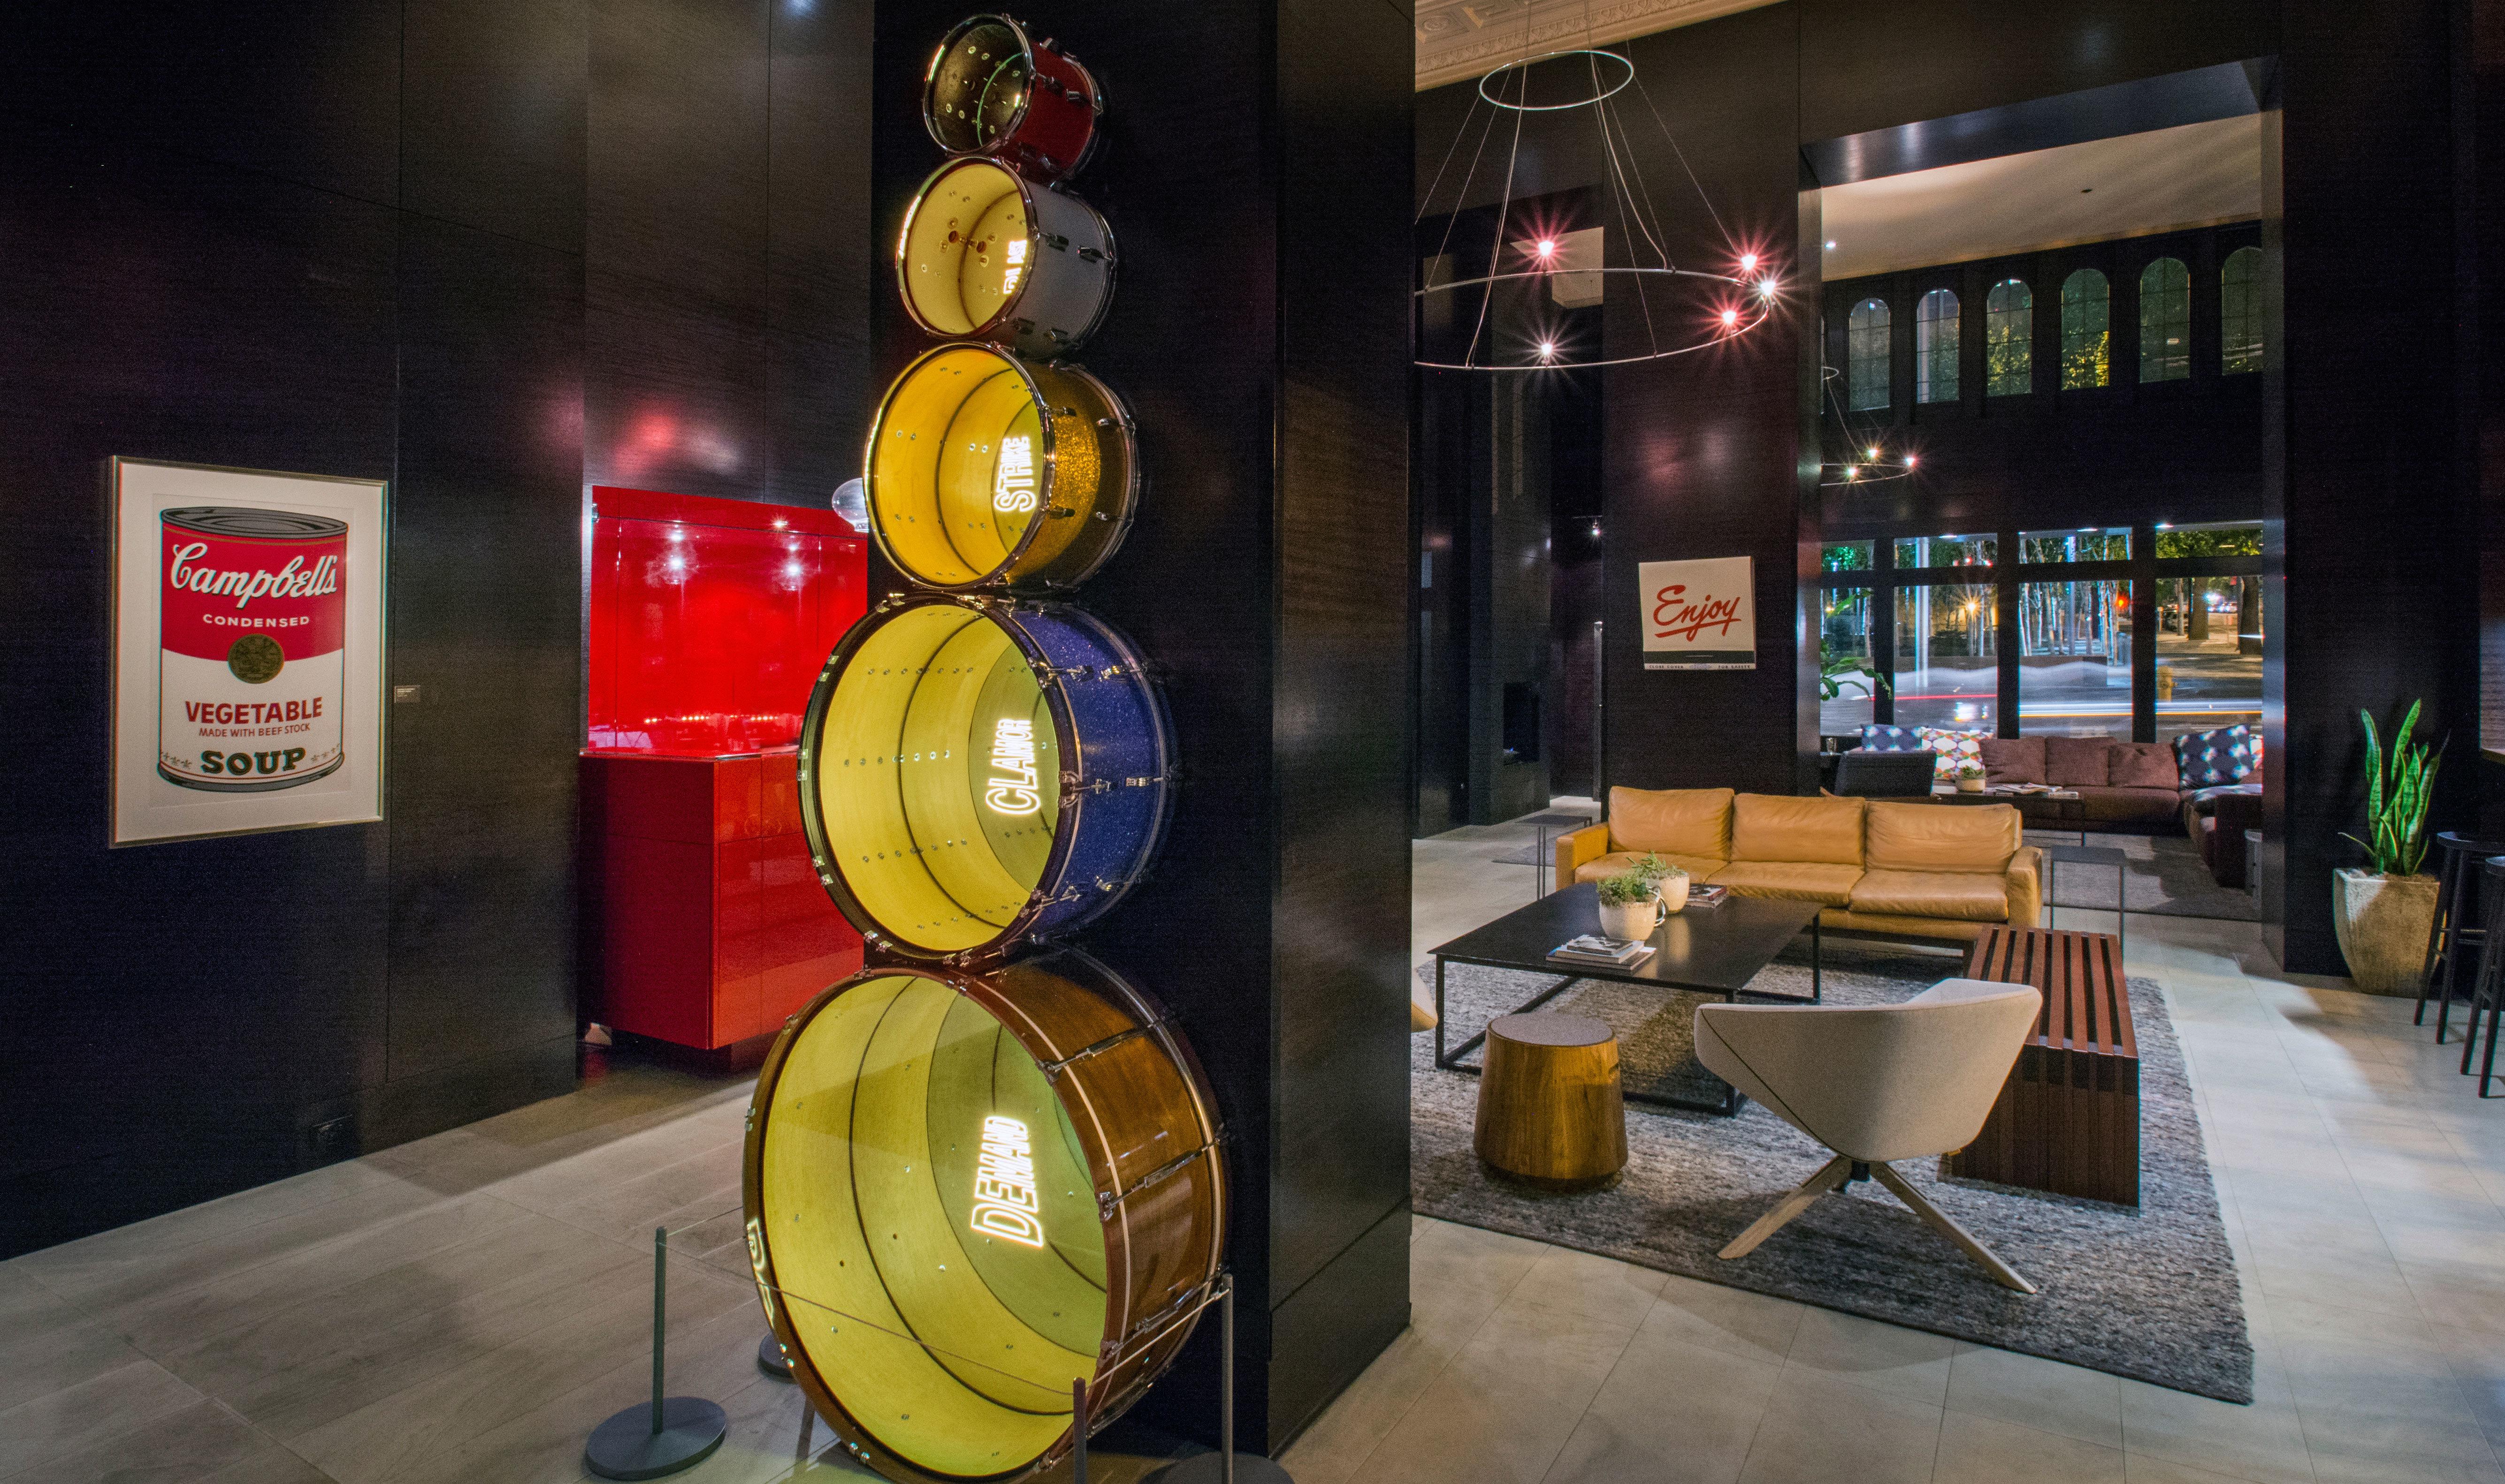 Hotel-Max-Seattle-Washington-lobby.jpg?mtime=20180925092628#asset:103336